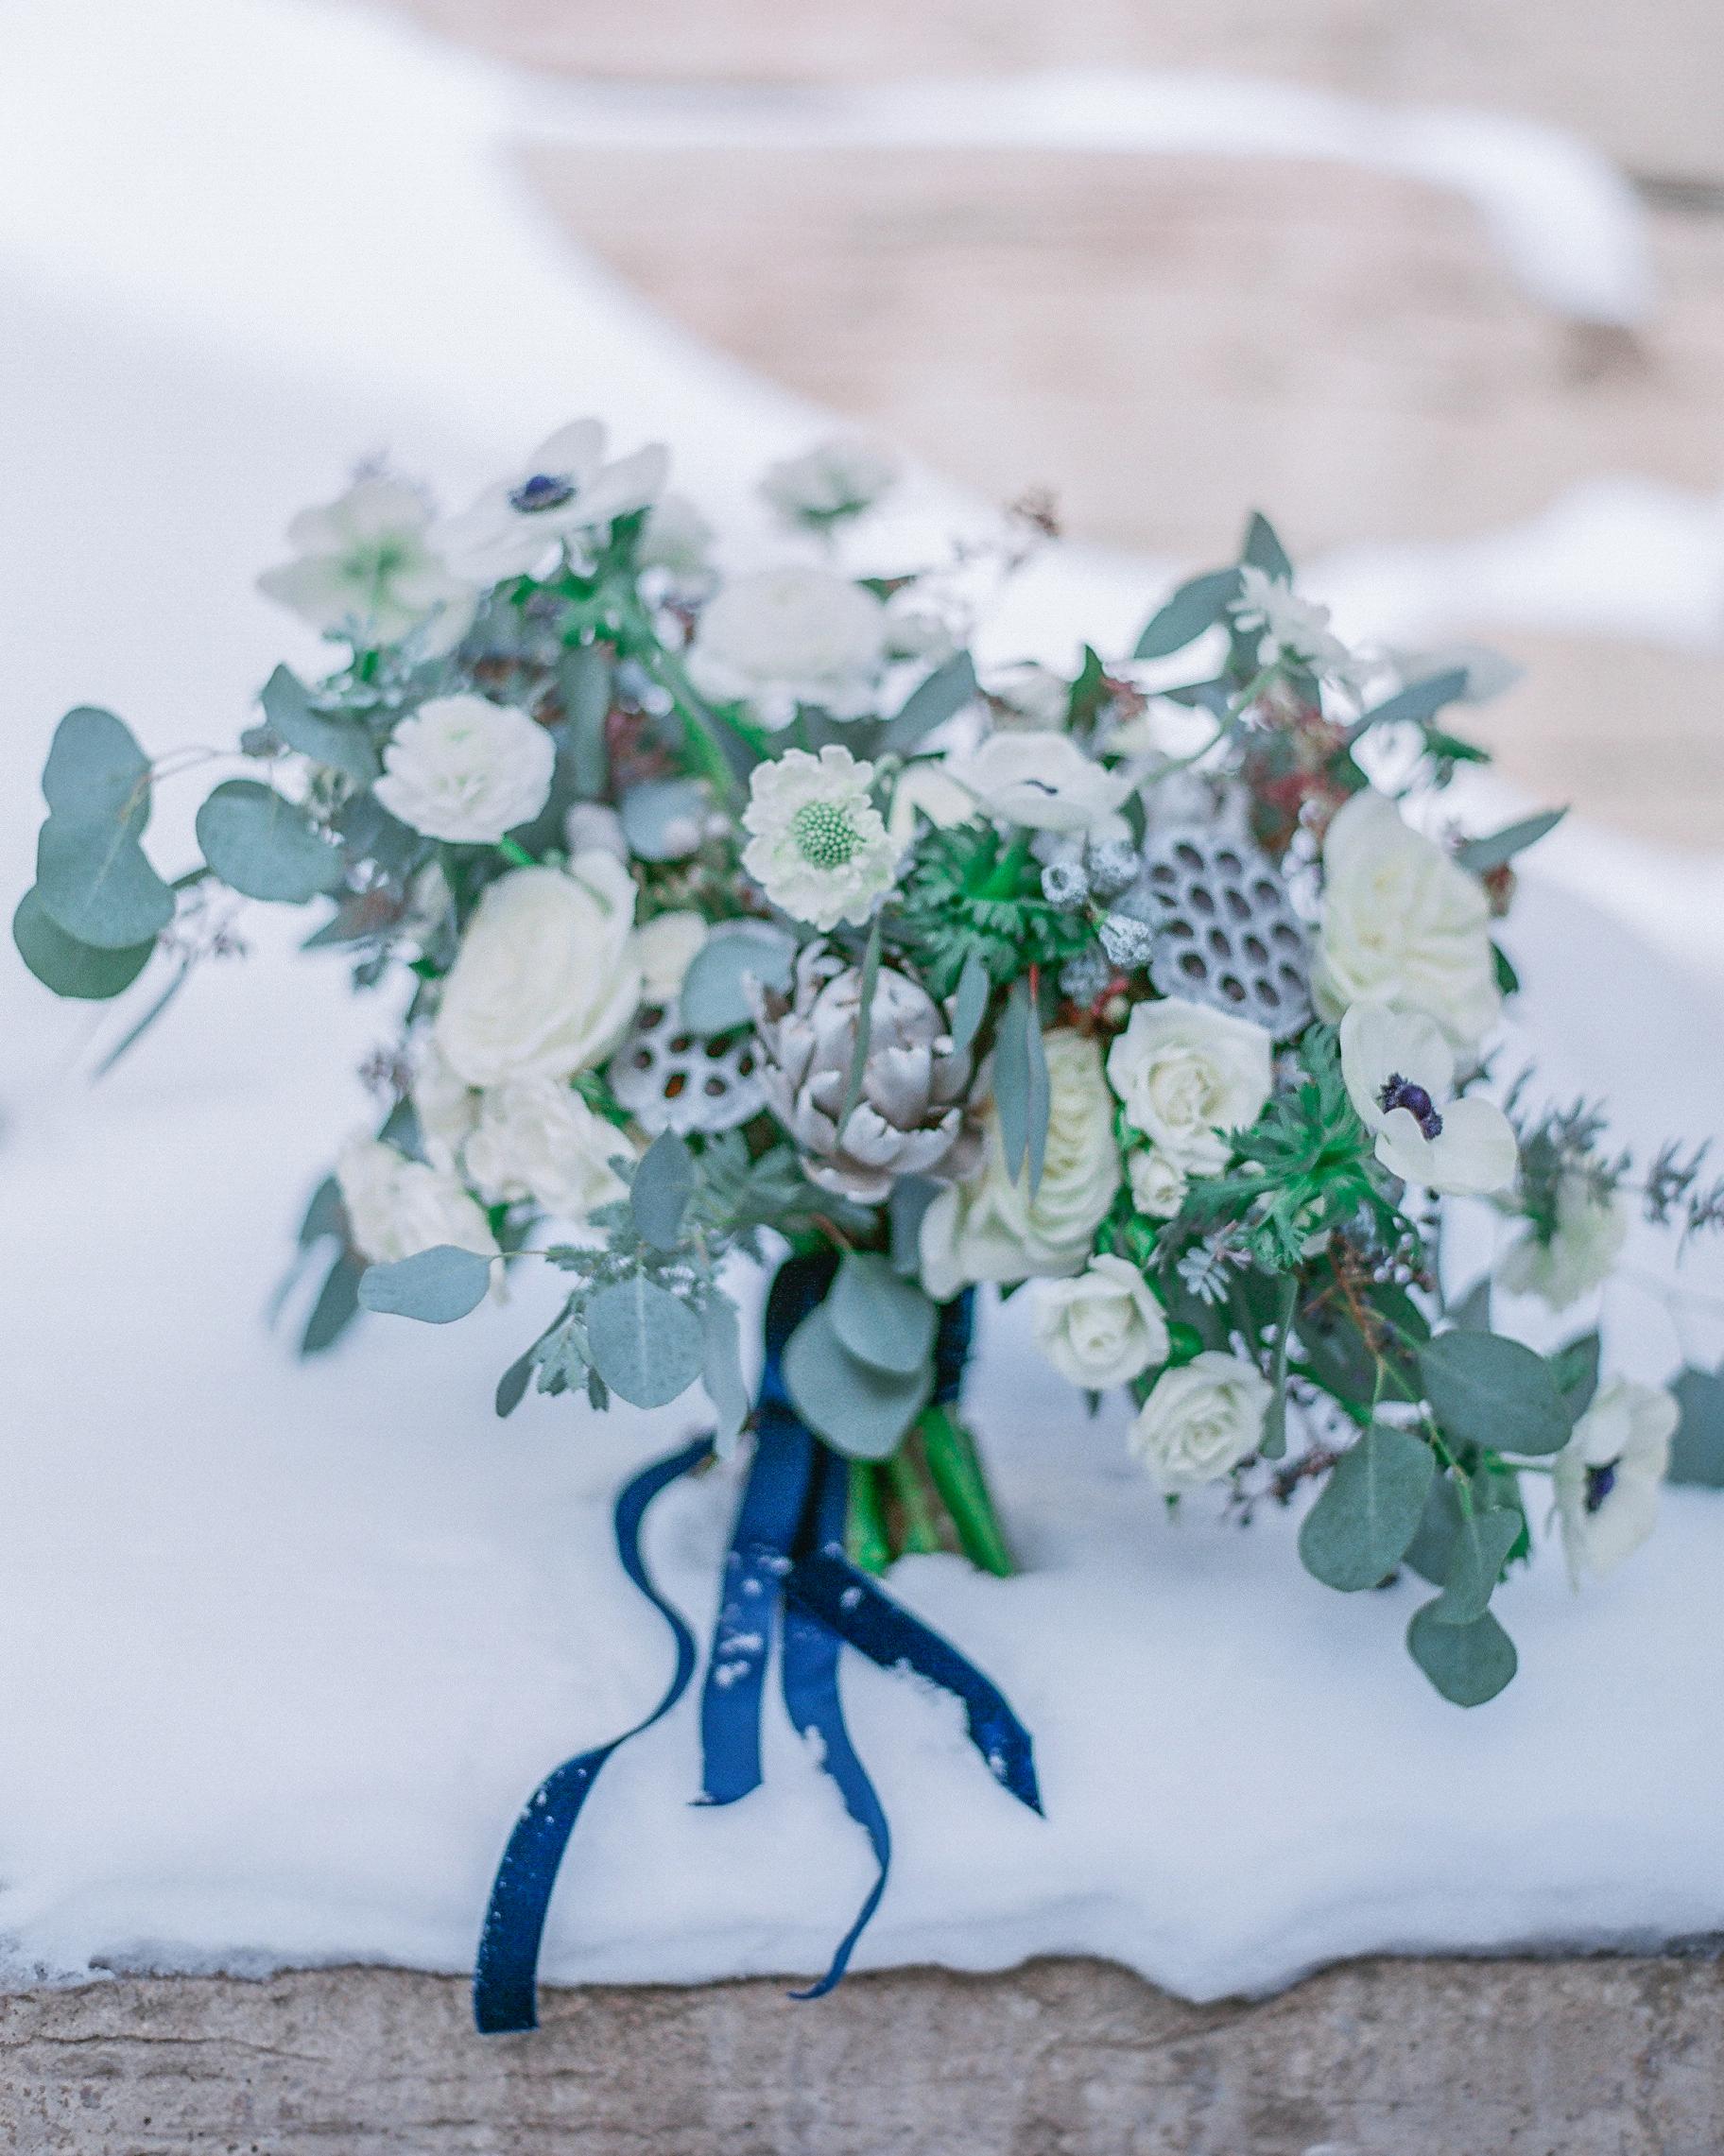 kendall-grant-wedding-bouquet-025-s112328-1215.jpg